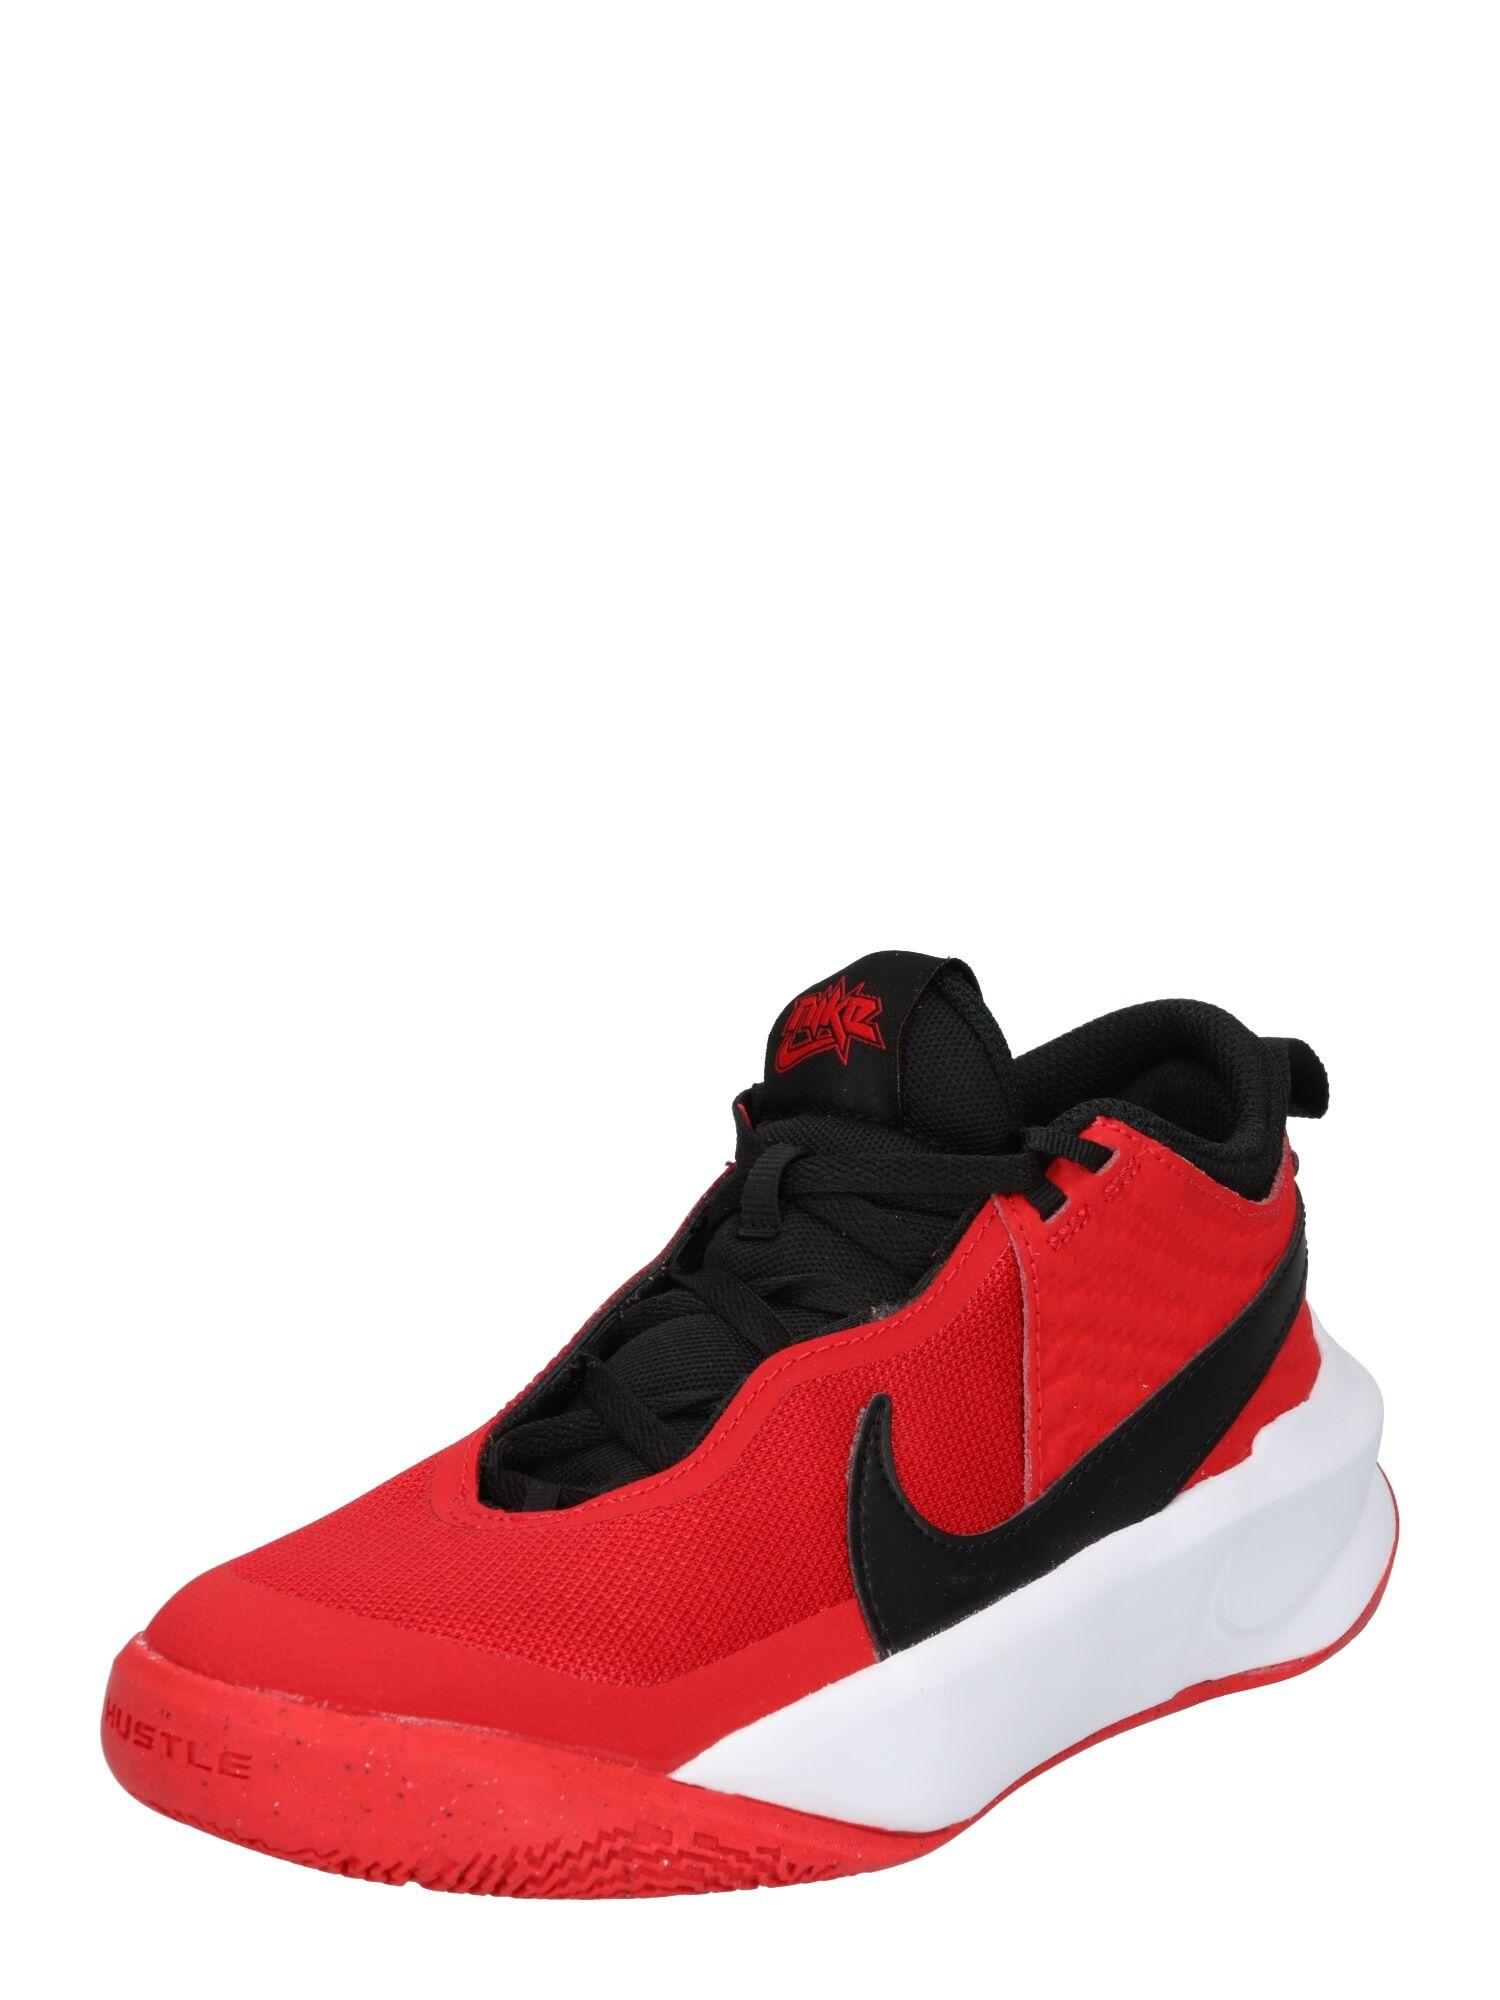 NIKE Chaussure de sport 'Team Hustle D 10'  - Rouge - Taille: 3.5Y - boy